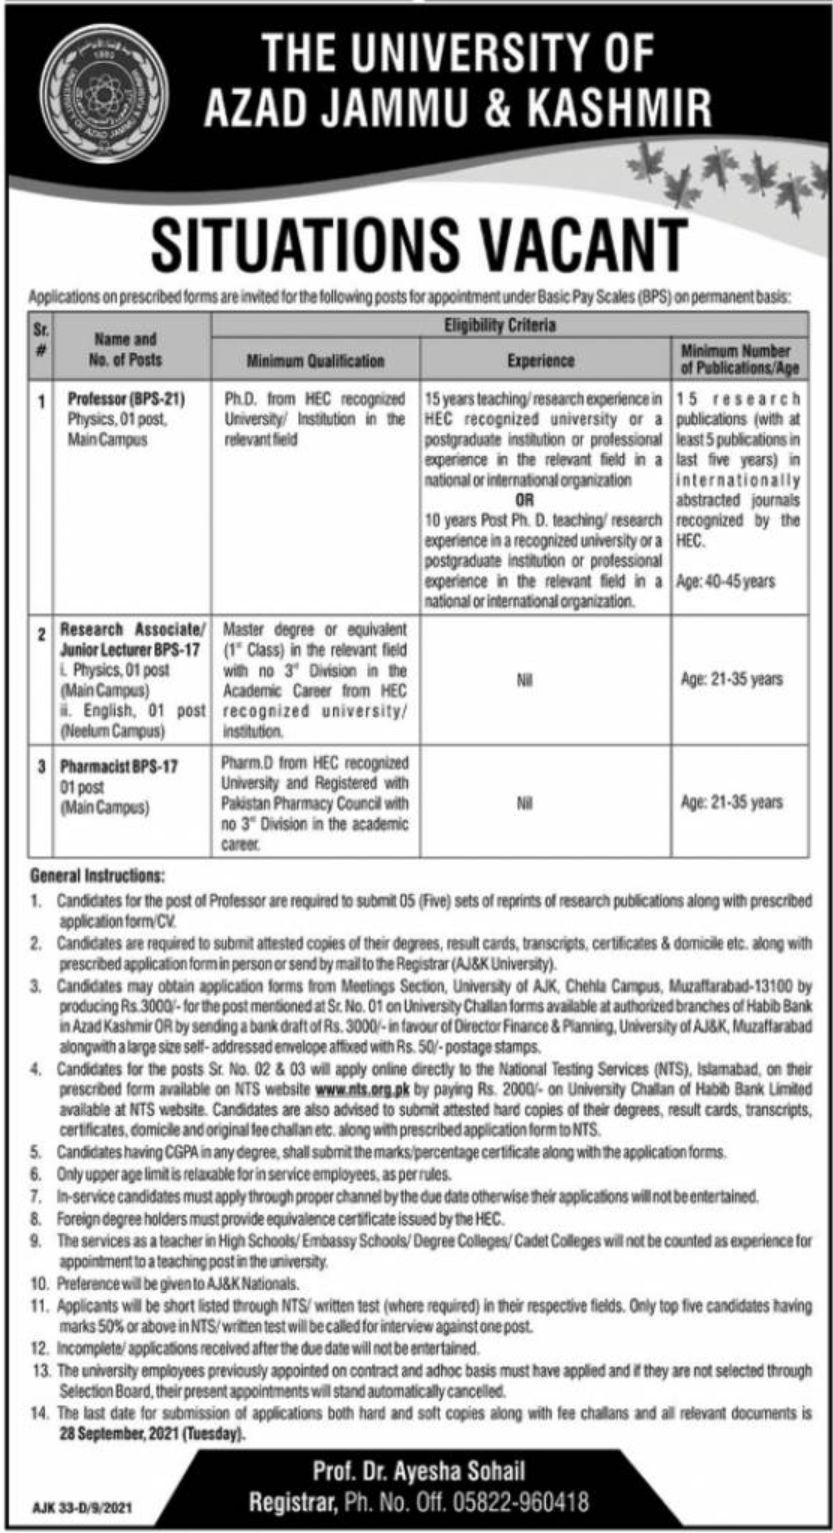 The University of Azad Jammu & Kashmir Jobs September 2021